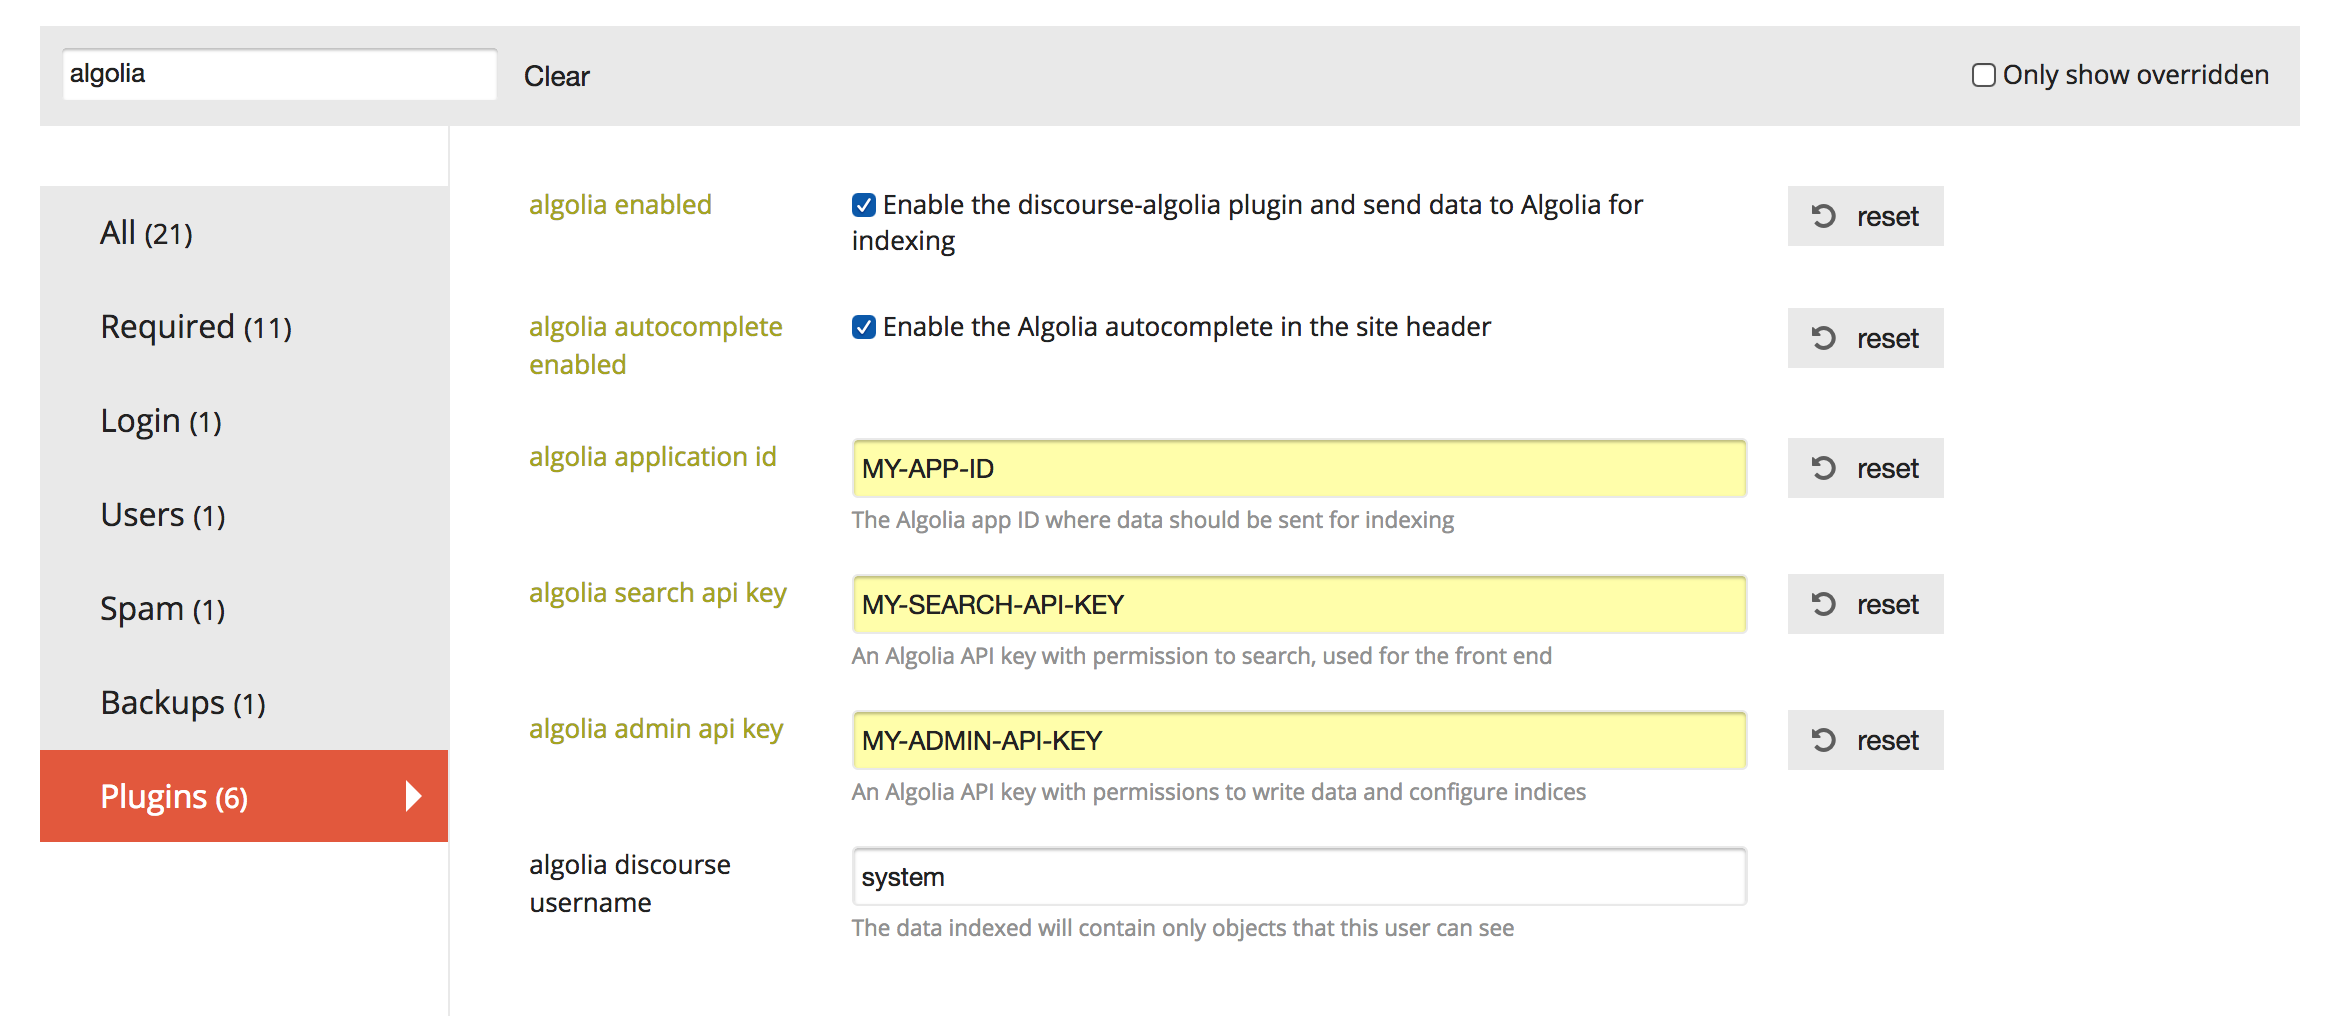 discourse-algolia populated configuration options